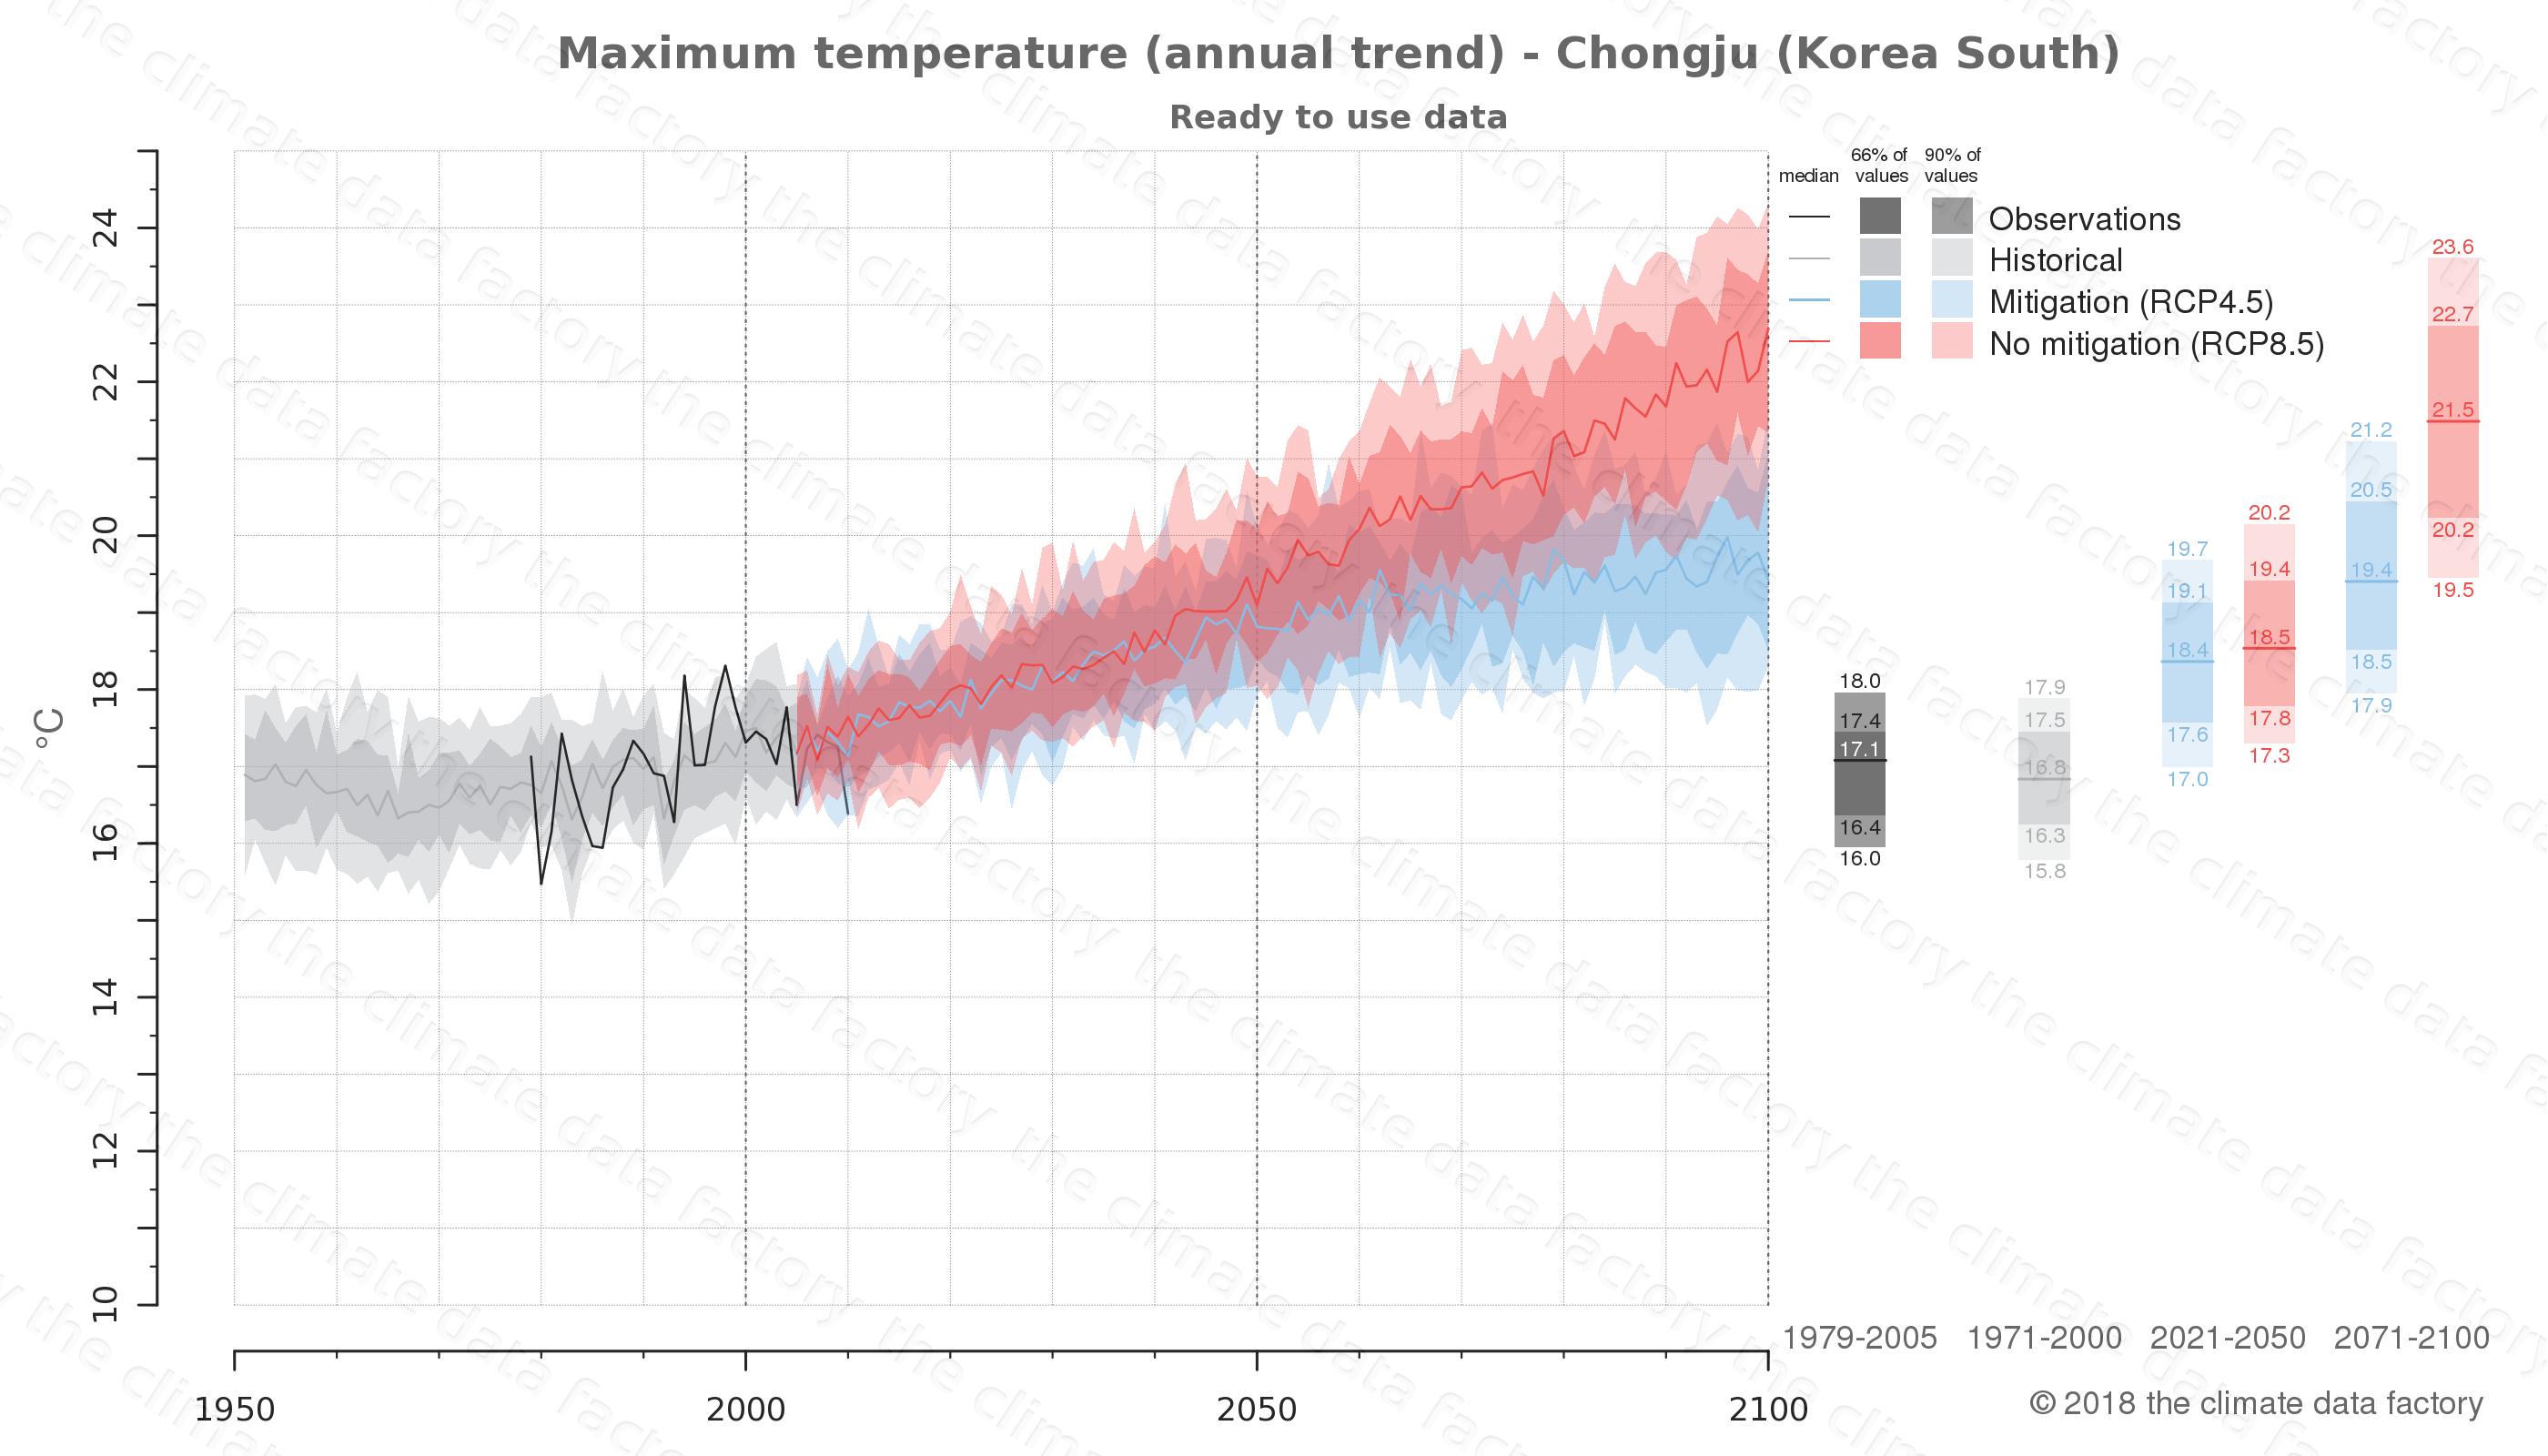 climate change data policy adaptation climate graph city data maximum-temperature chongju south korea